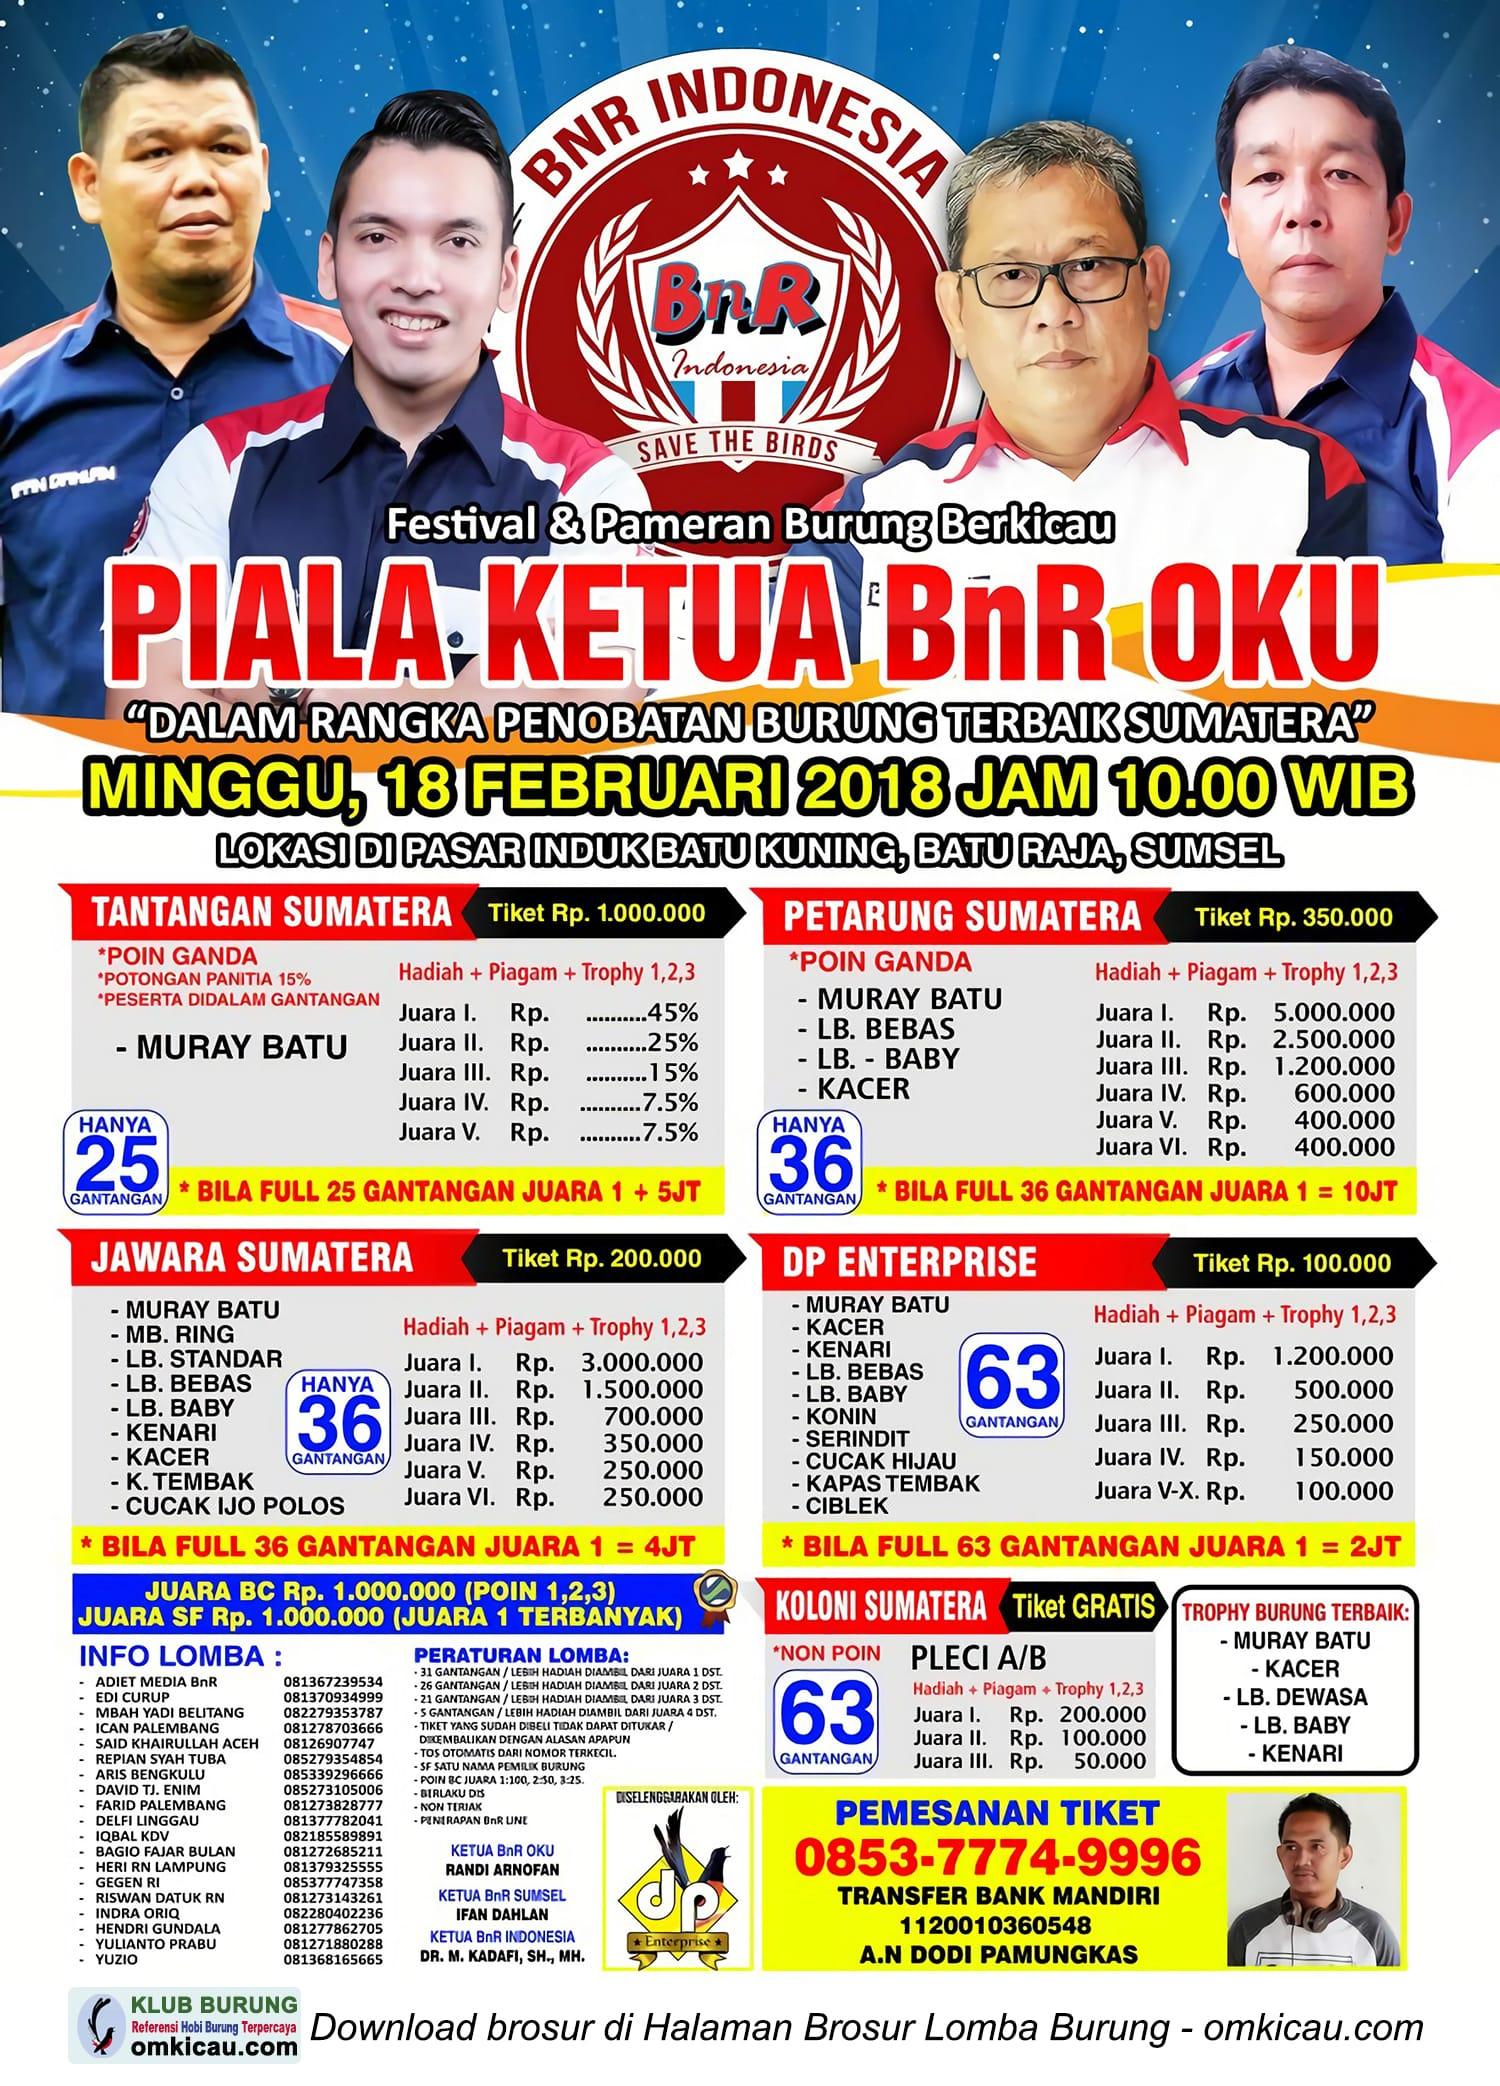 Piala Ketua BnR OKU